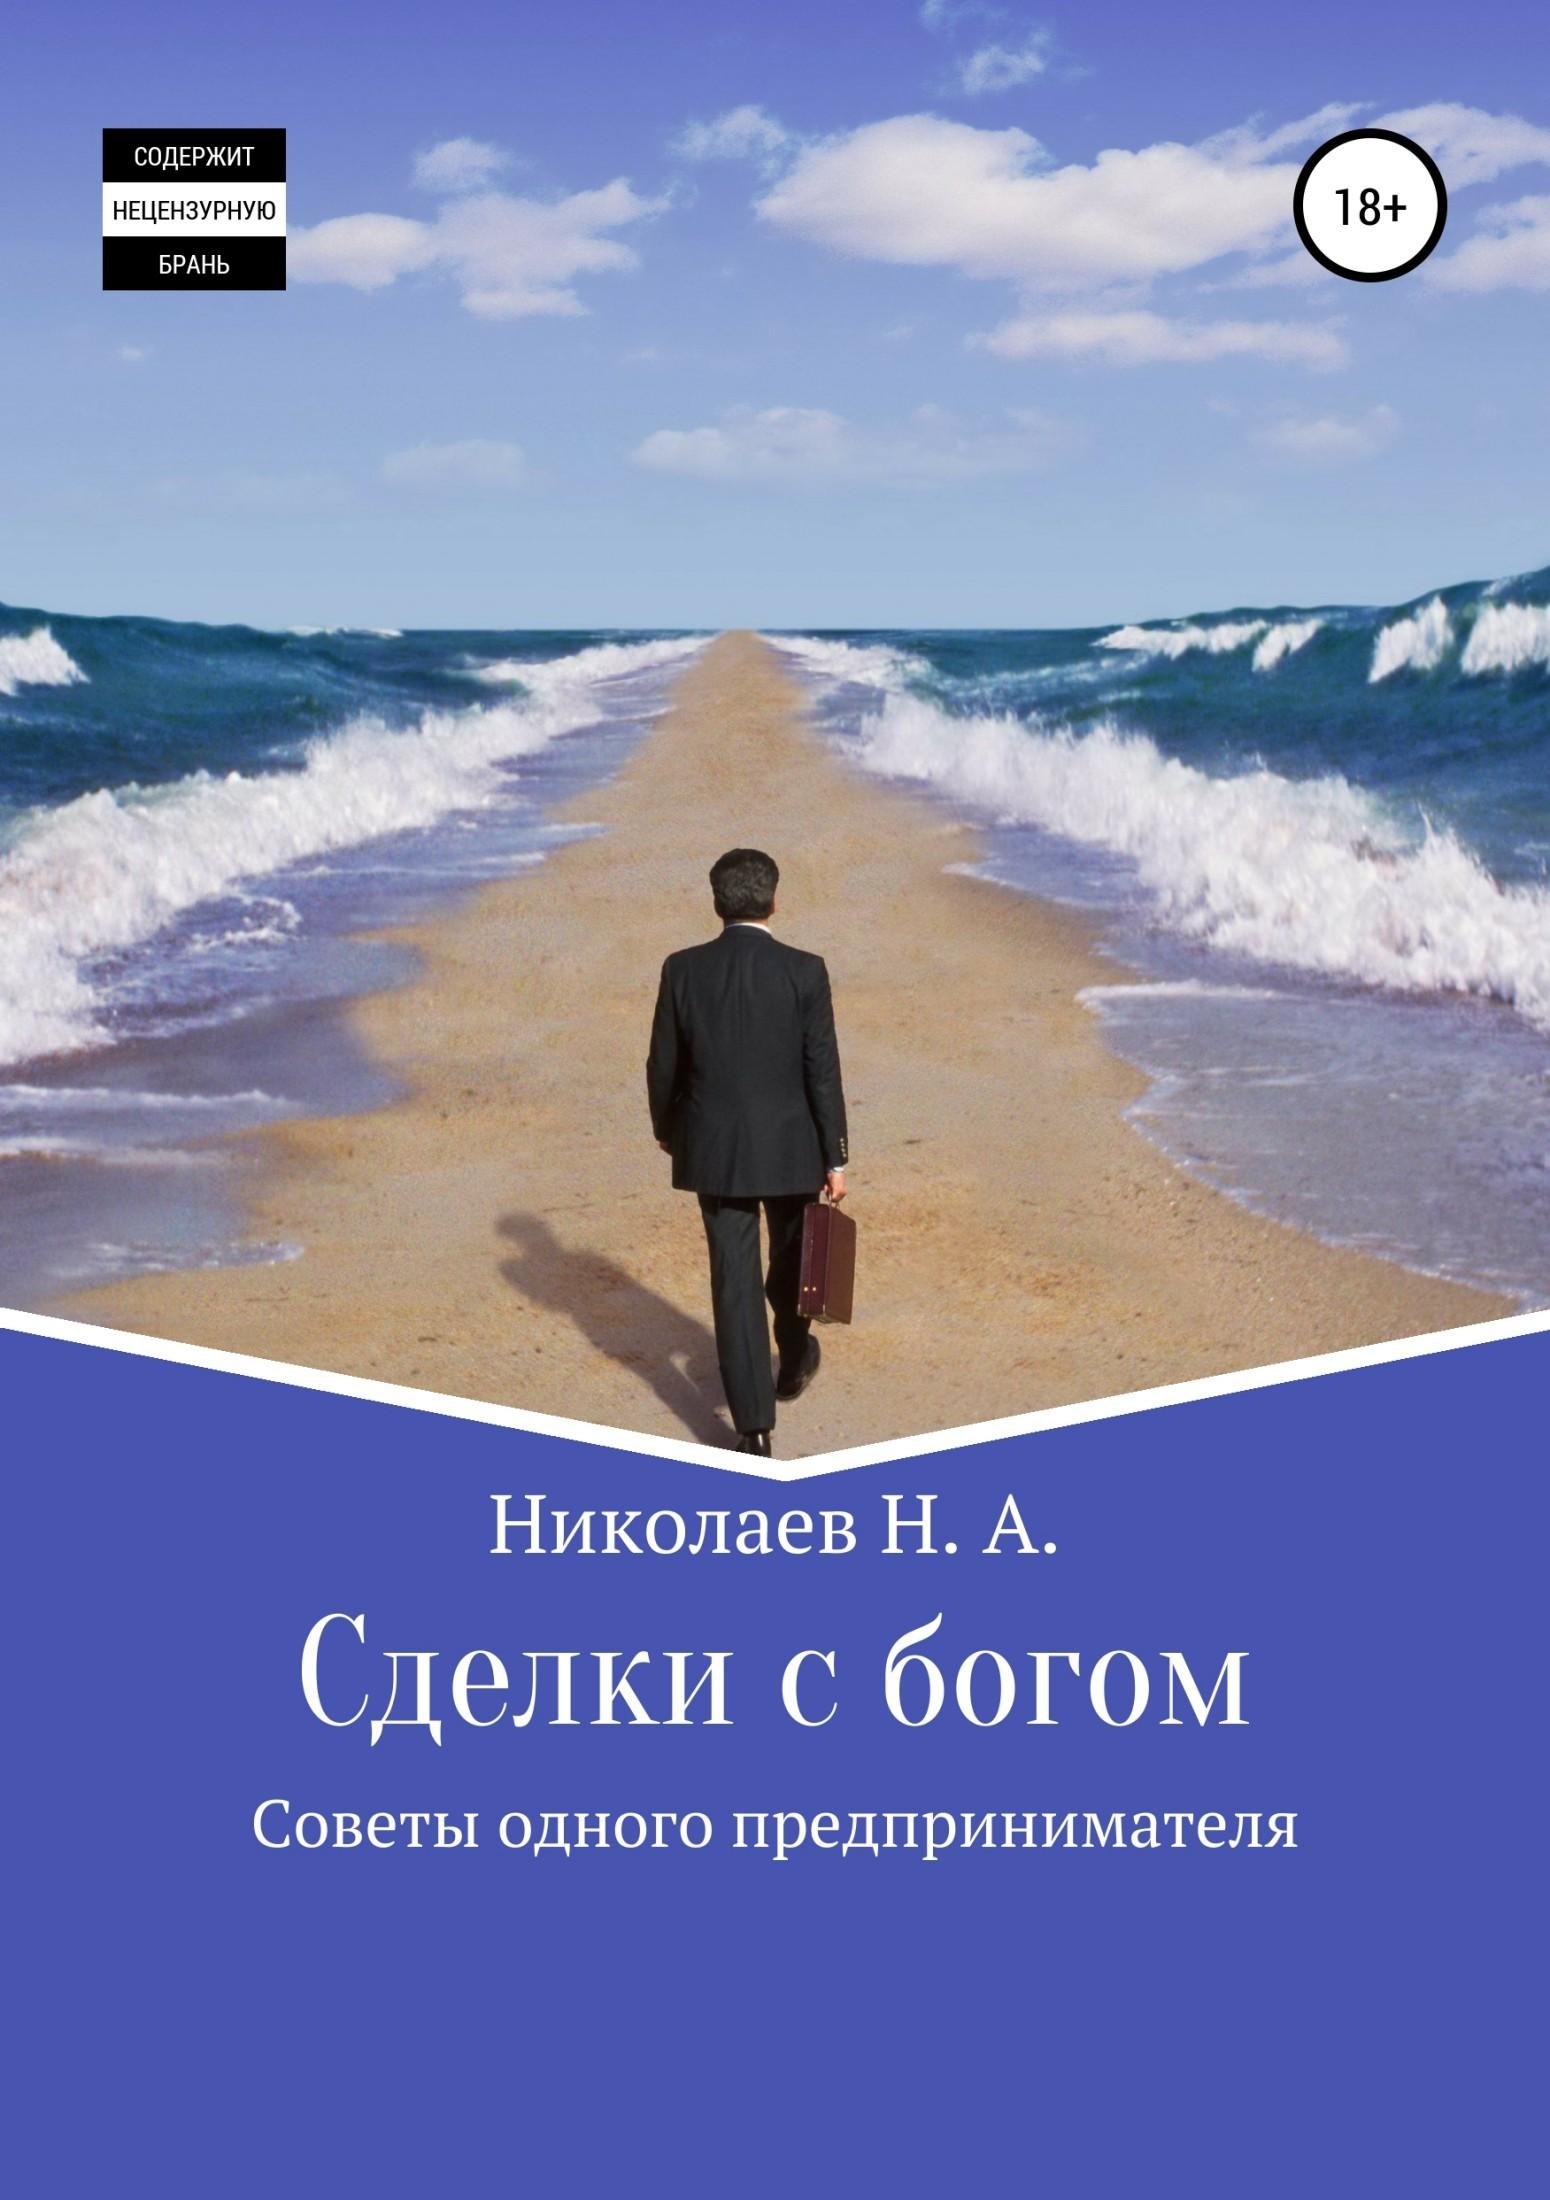 Обложка книги. Автор - Николай Николаев